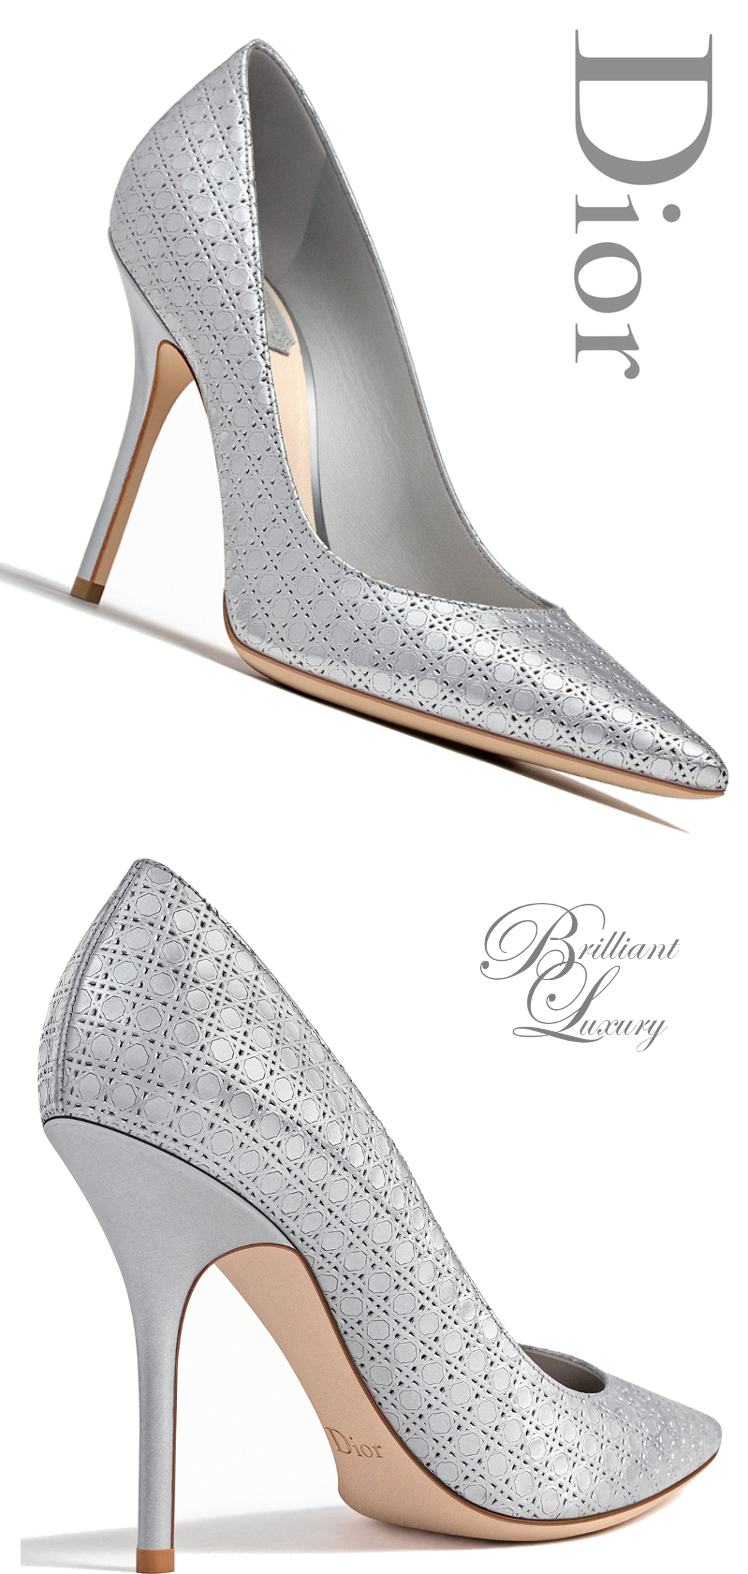 Brilliant Luxury   Dior Pump Fall 2015-16   S H O E S.   Pinterest ... 8f58d1f324a